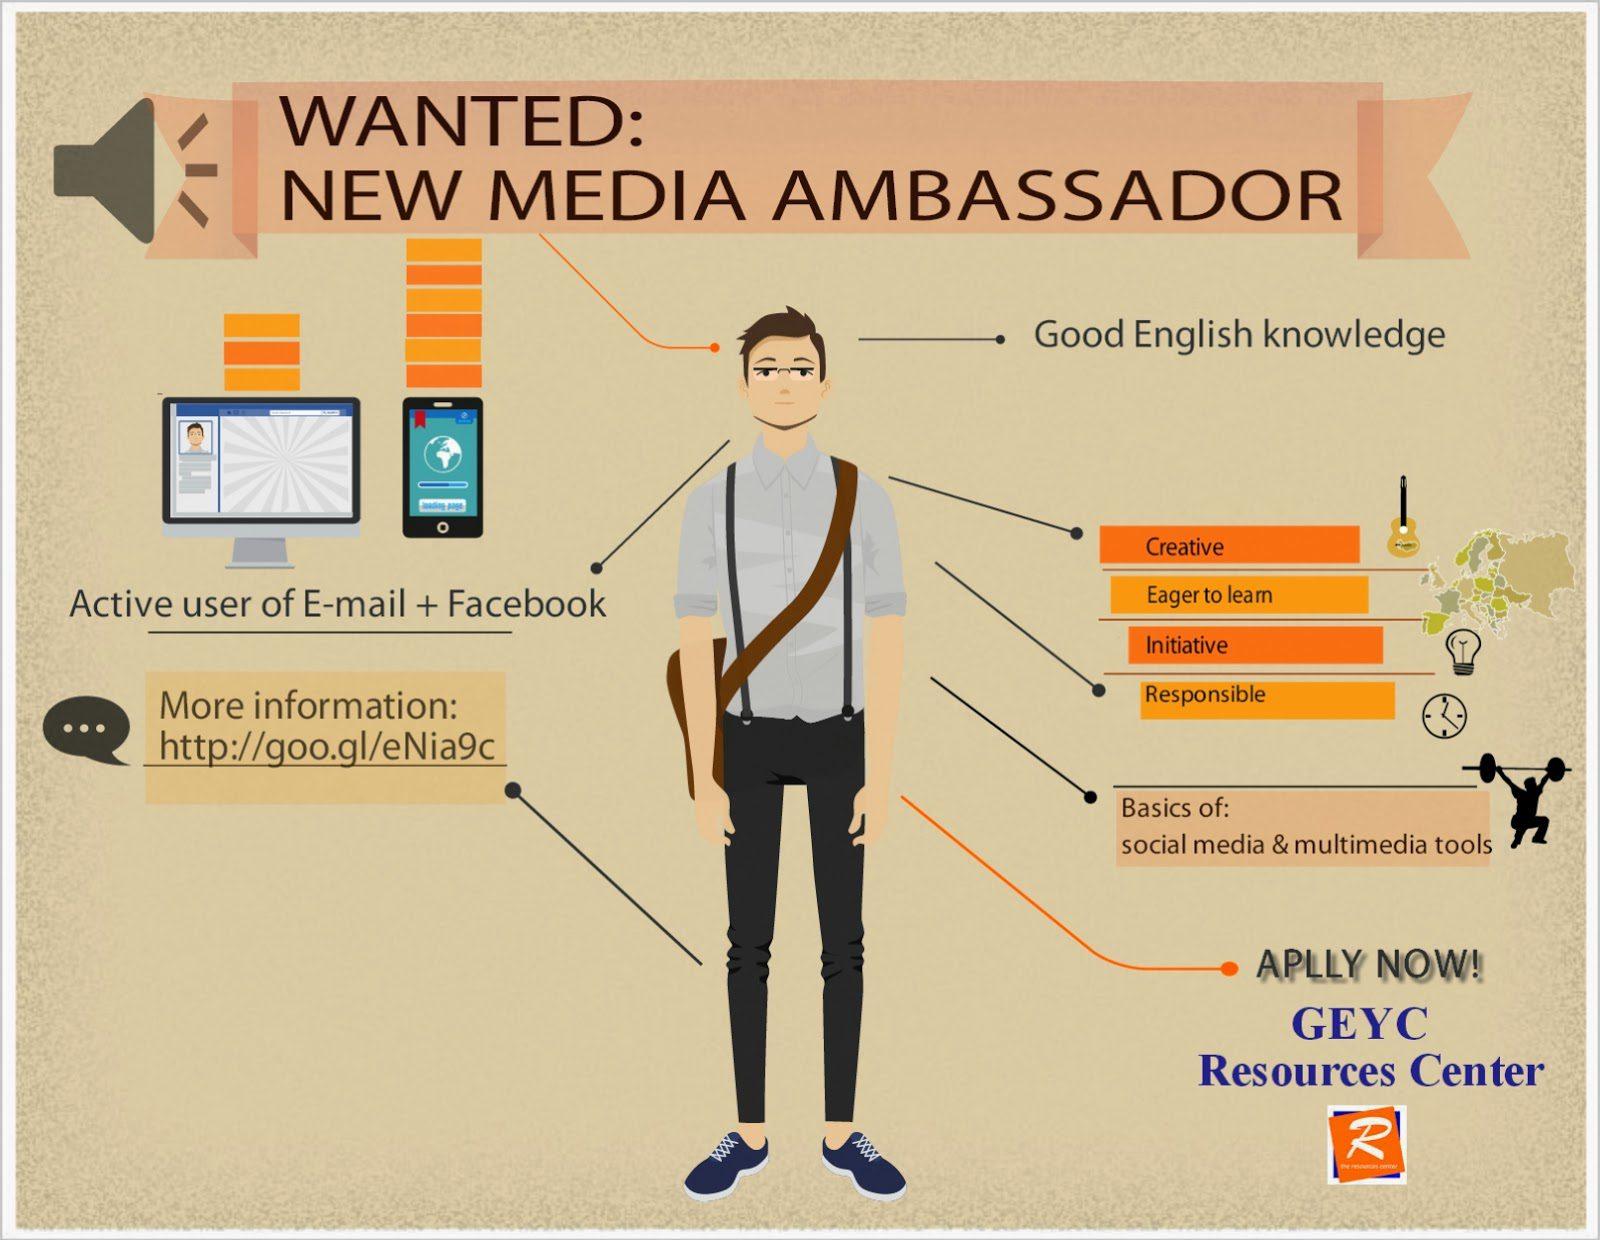 new-media-ambassador-geyc-resource-center